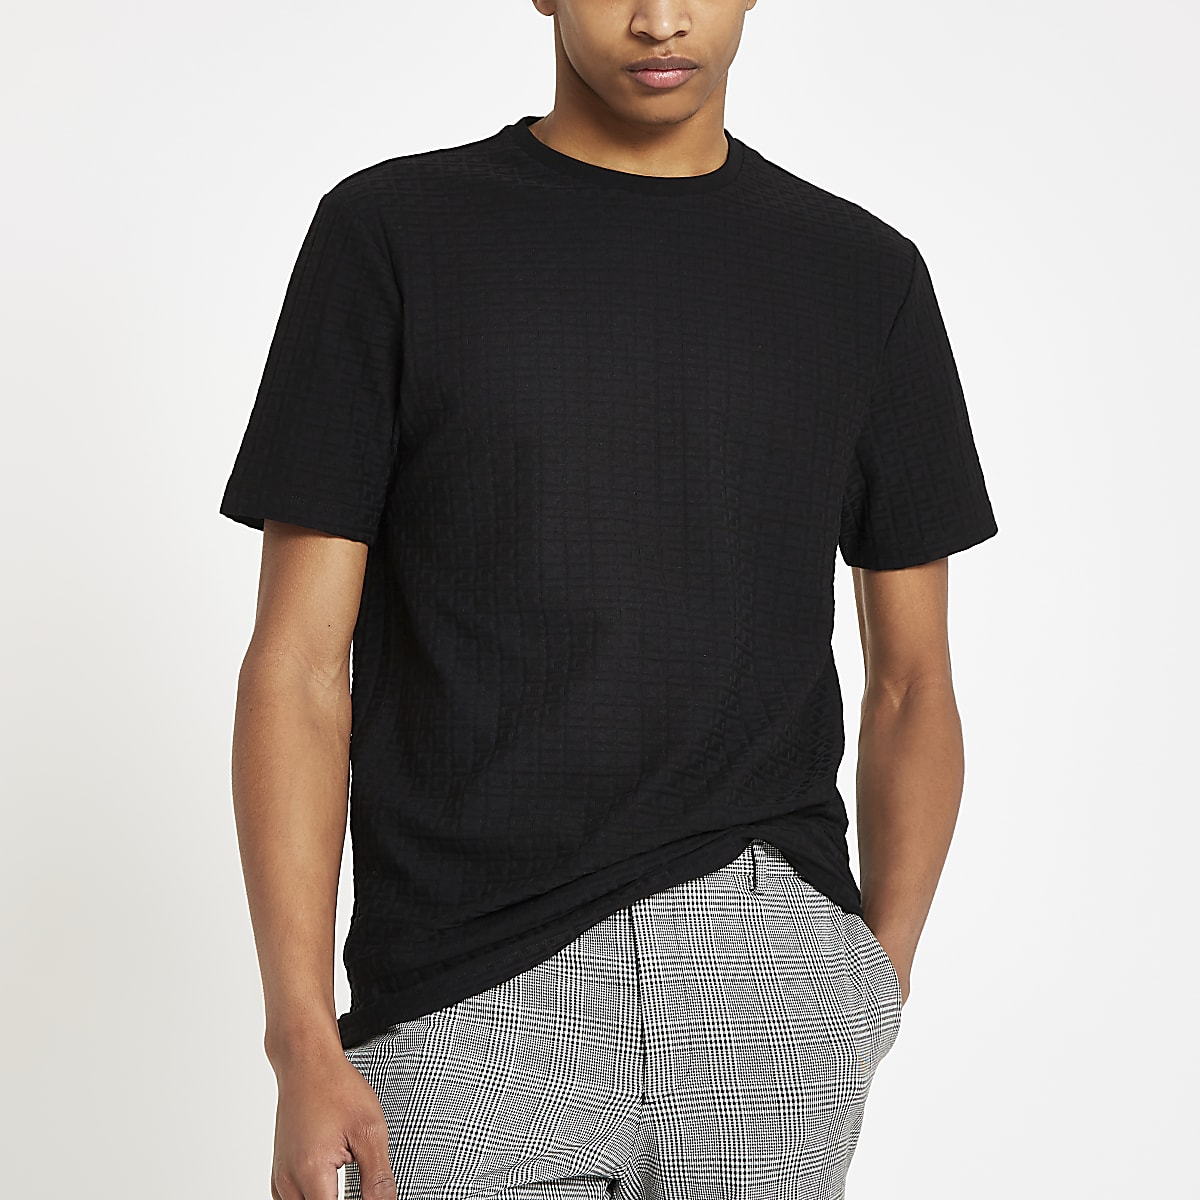 Schwarzes Jacquard-T-Shirt